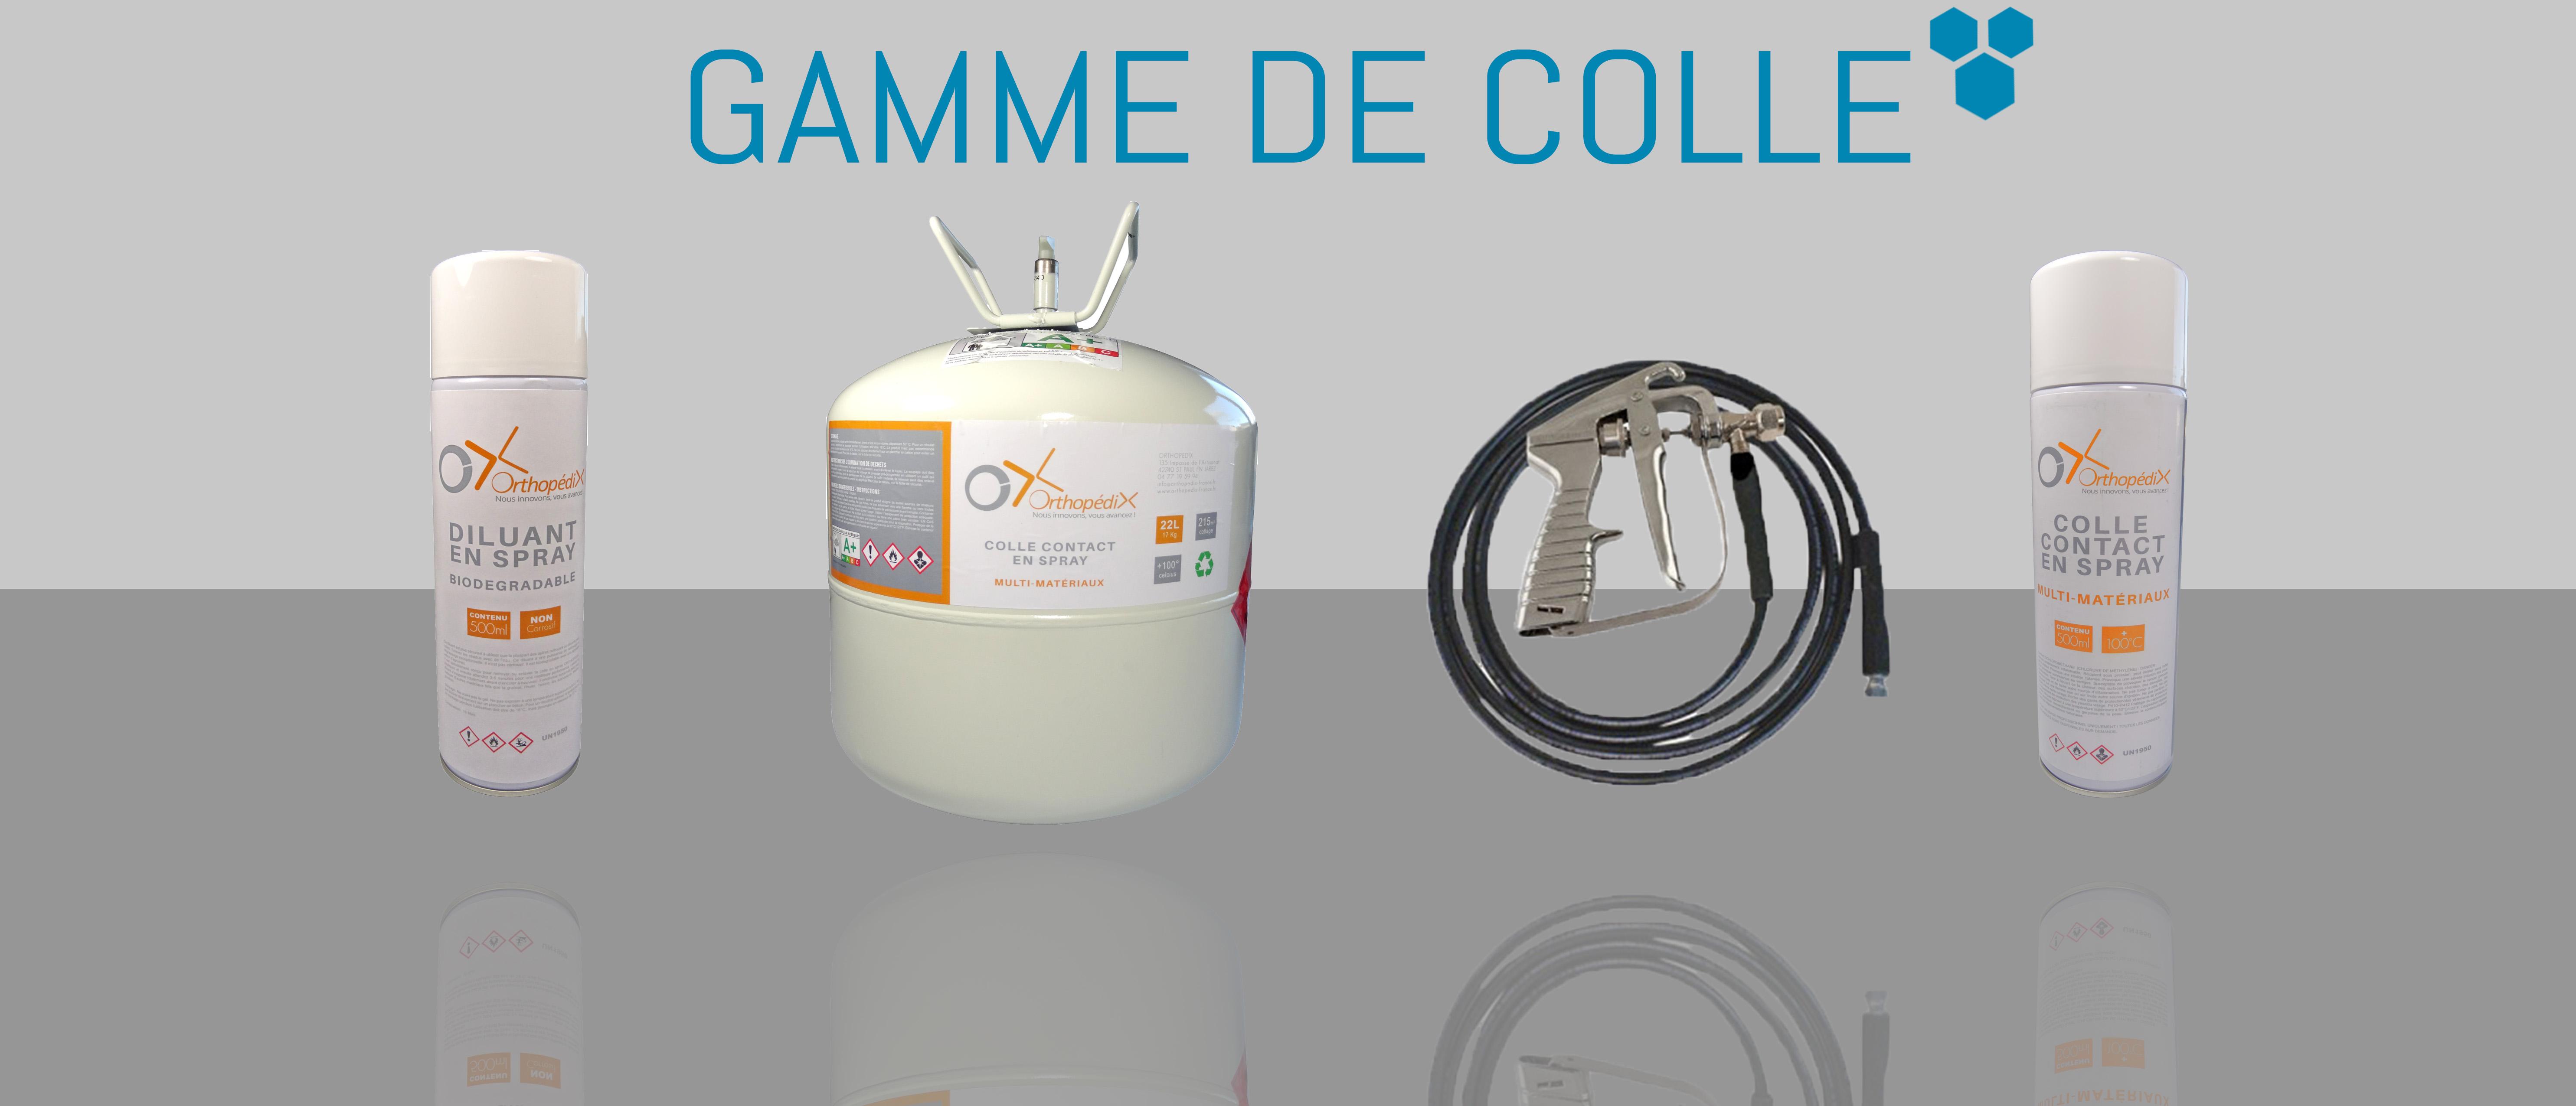 GAMME_DE_COLLE2020_new